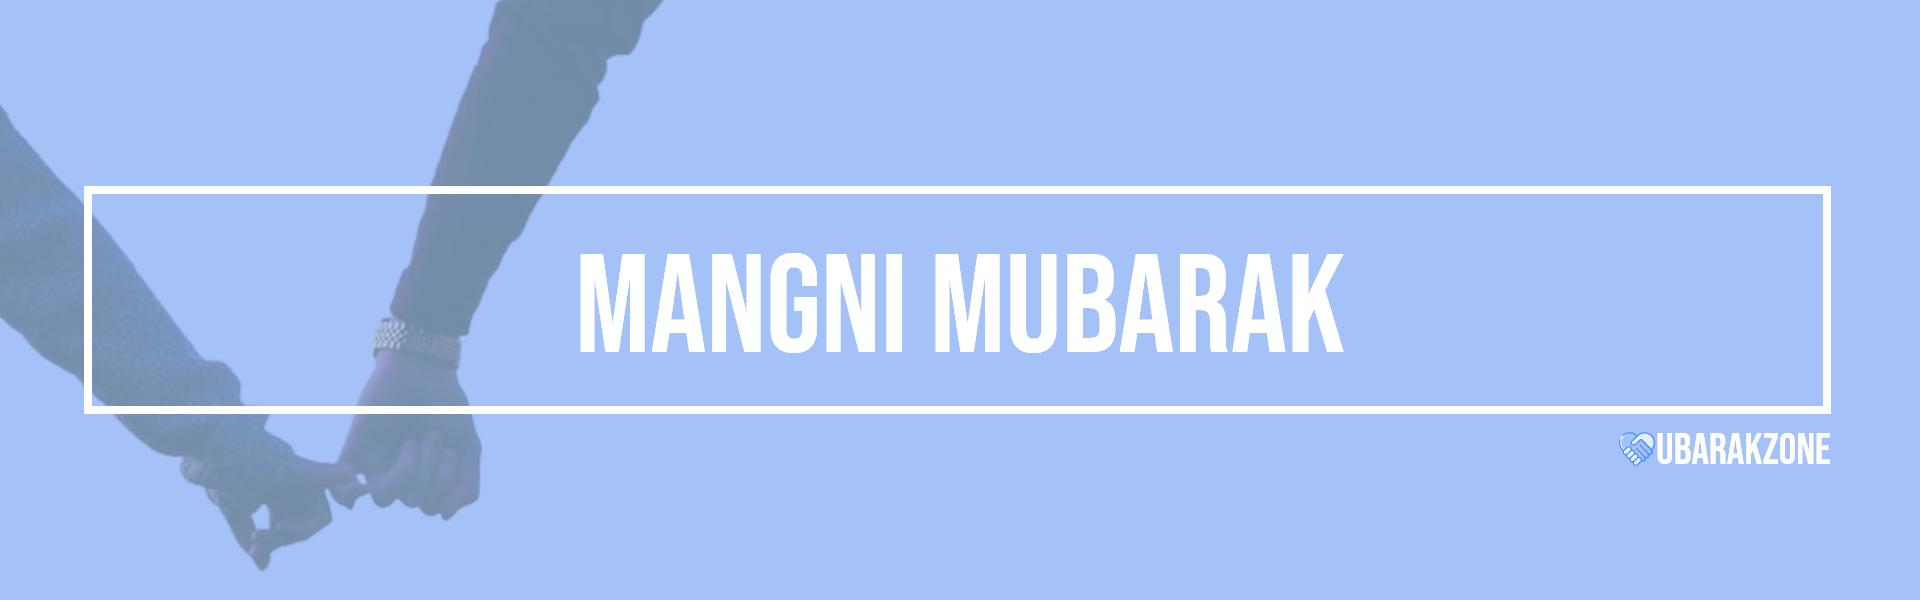 mangni mubarak wishes messages